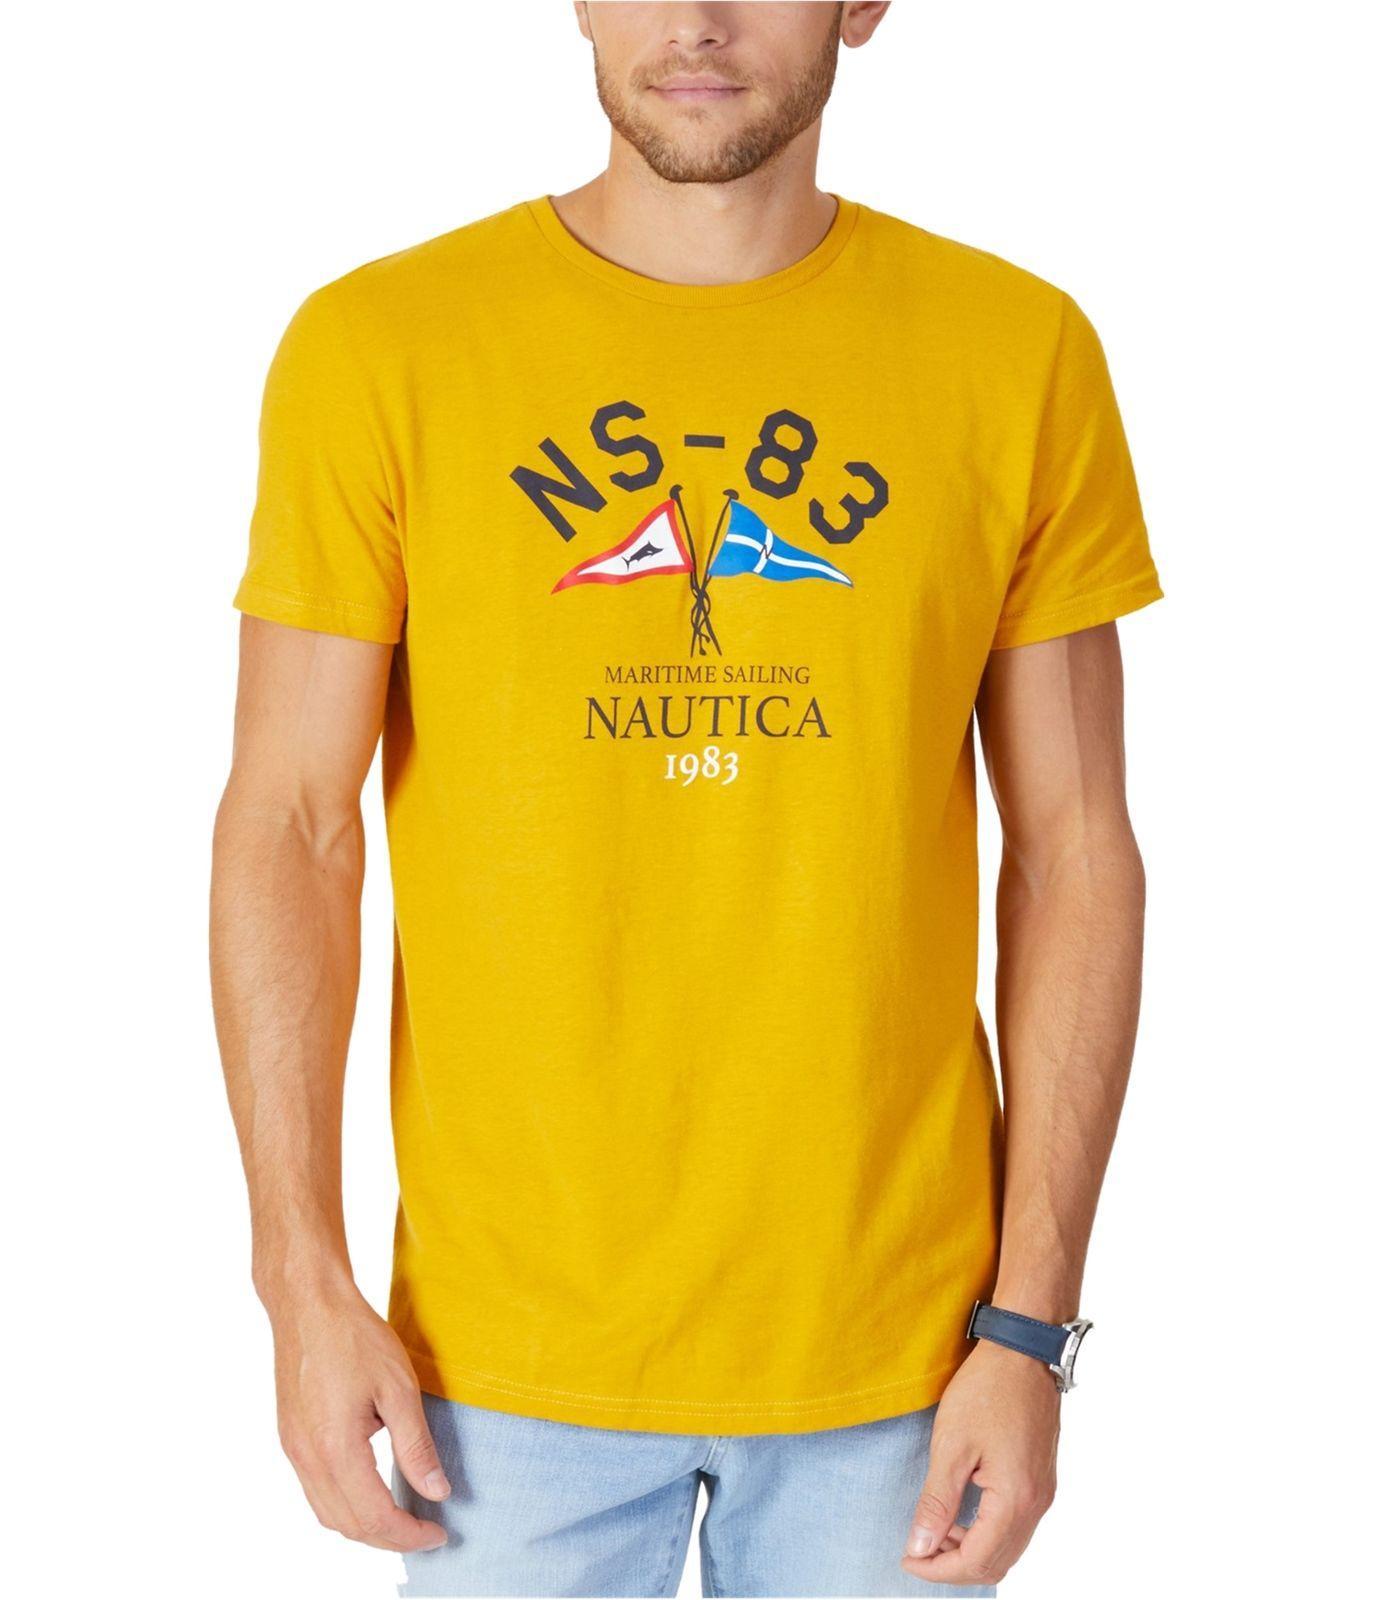 e7f478274e50 Nautica Mens Martime Sailing Graphic T Shirt Men Women Unisex Fashion Tshirt  Funny Cool Top Tee Black Online T Shirt Printing On T Shirts From ...